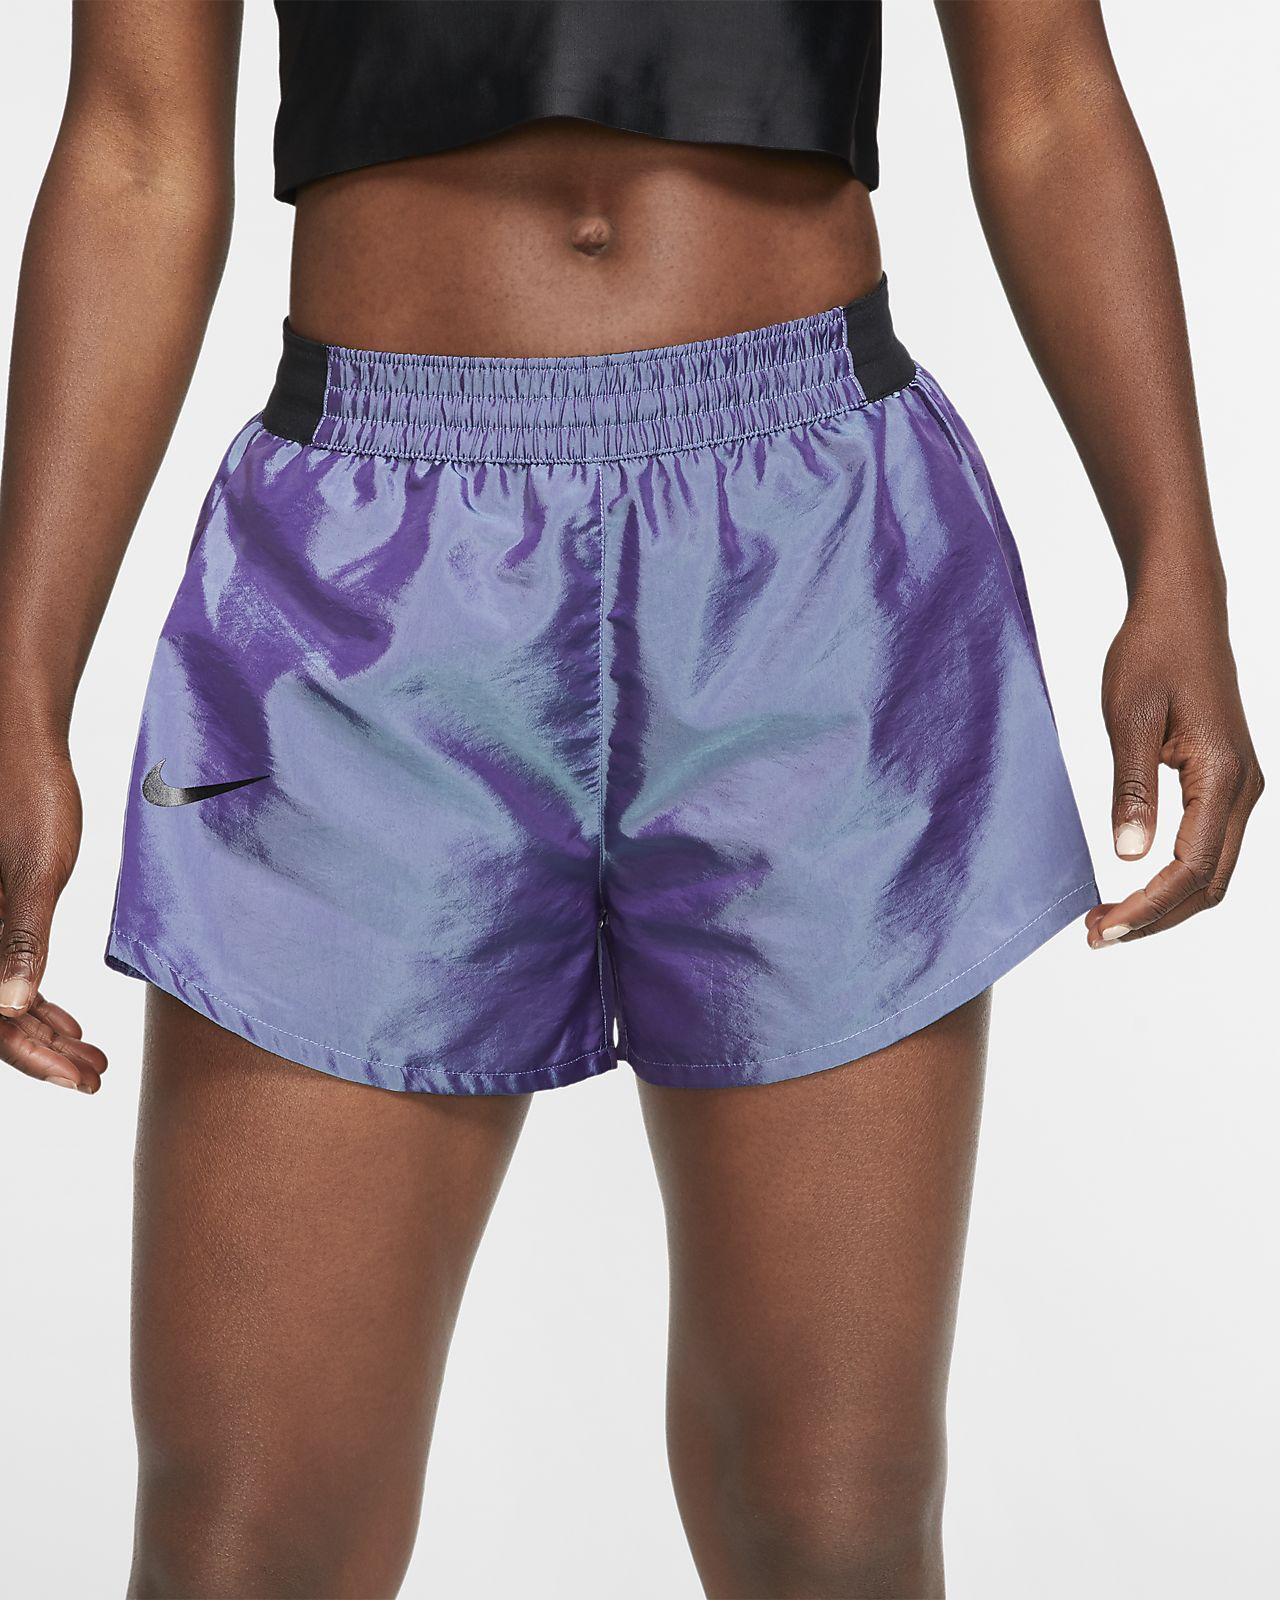 nike tempo running shorts woman